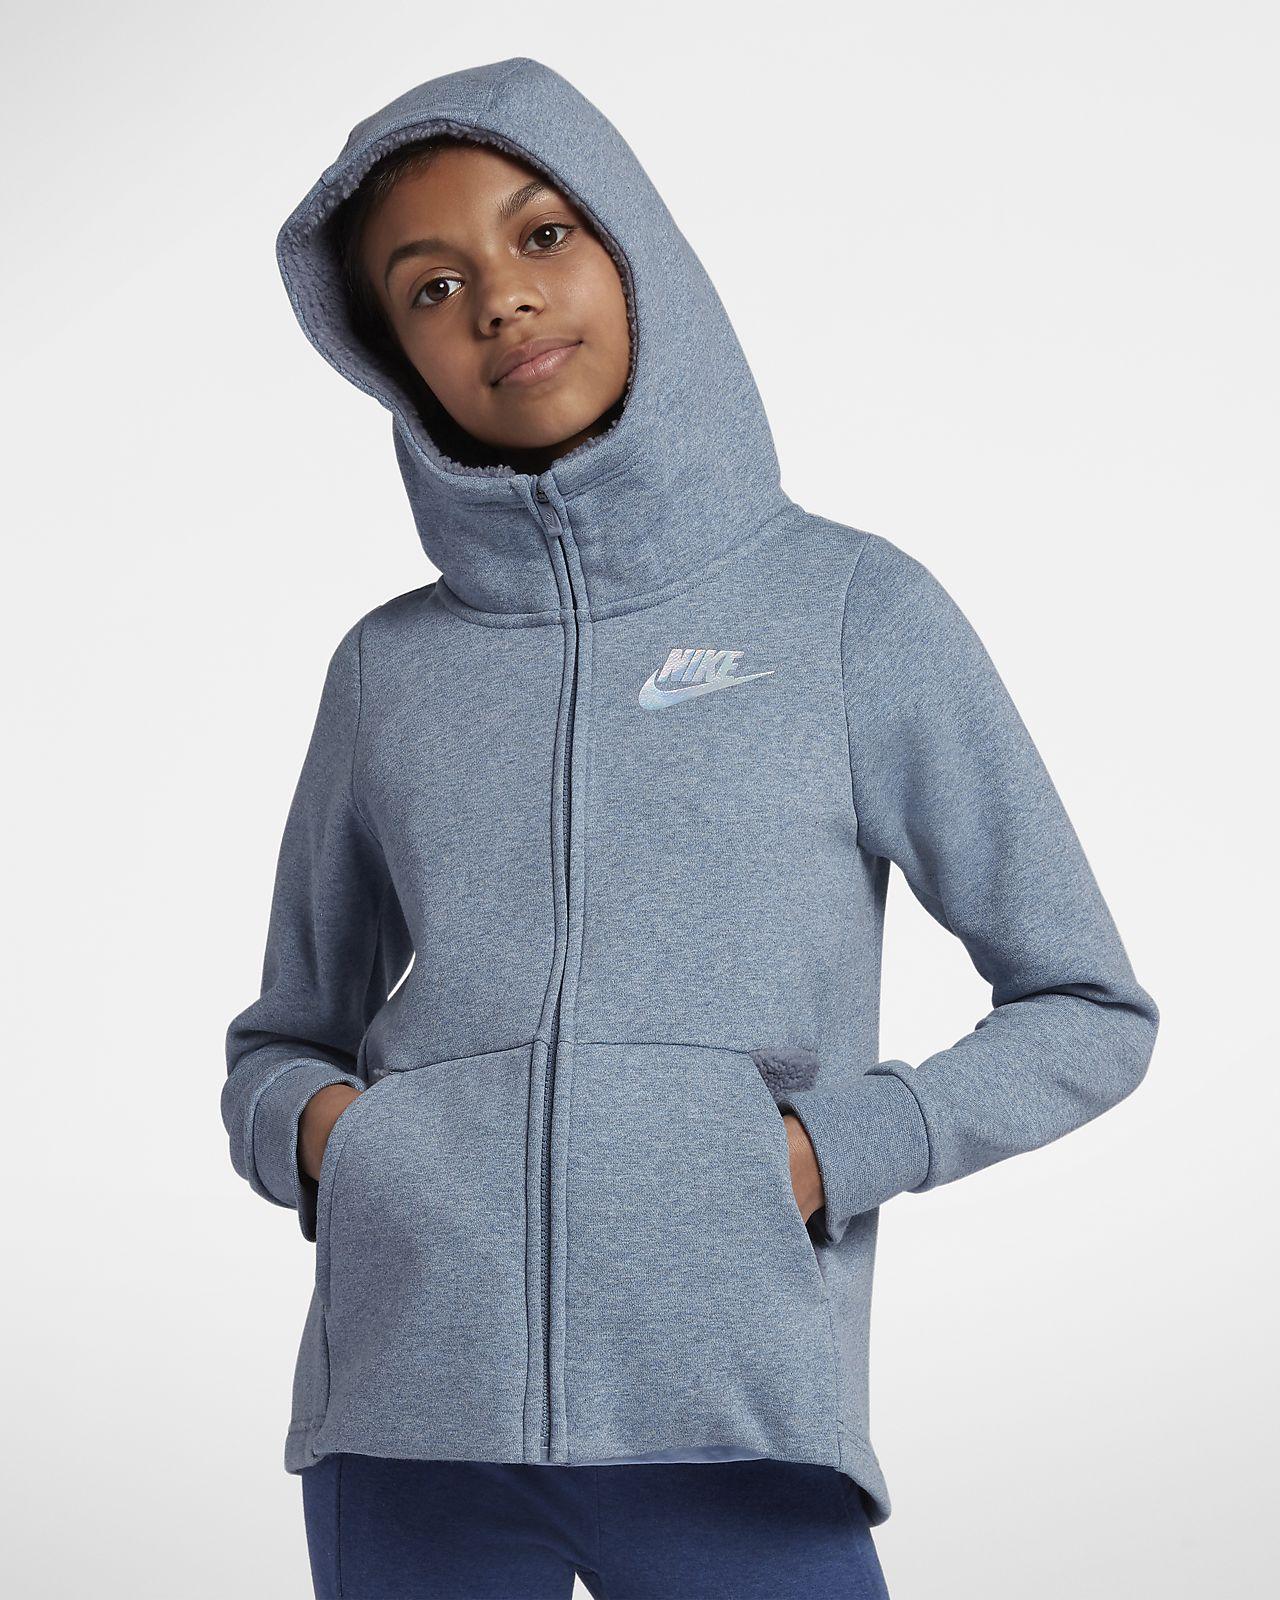 83ab0bec736f Nike Sportswear Older Kids  (Girls ) Full-Zip Hoodie. Nike.com IE